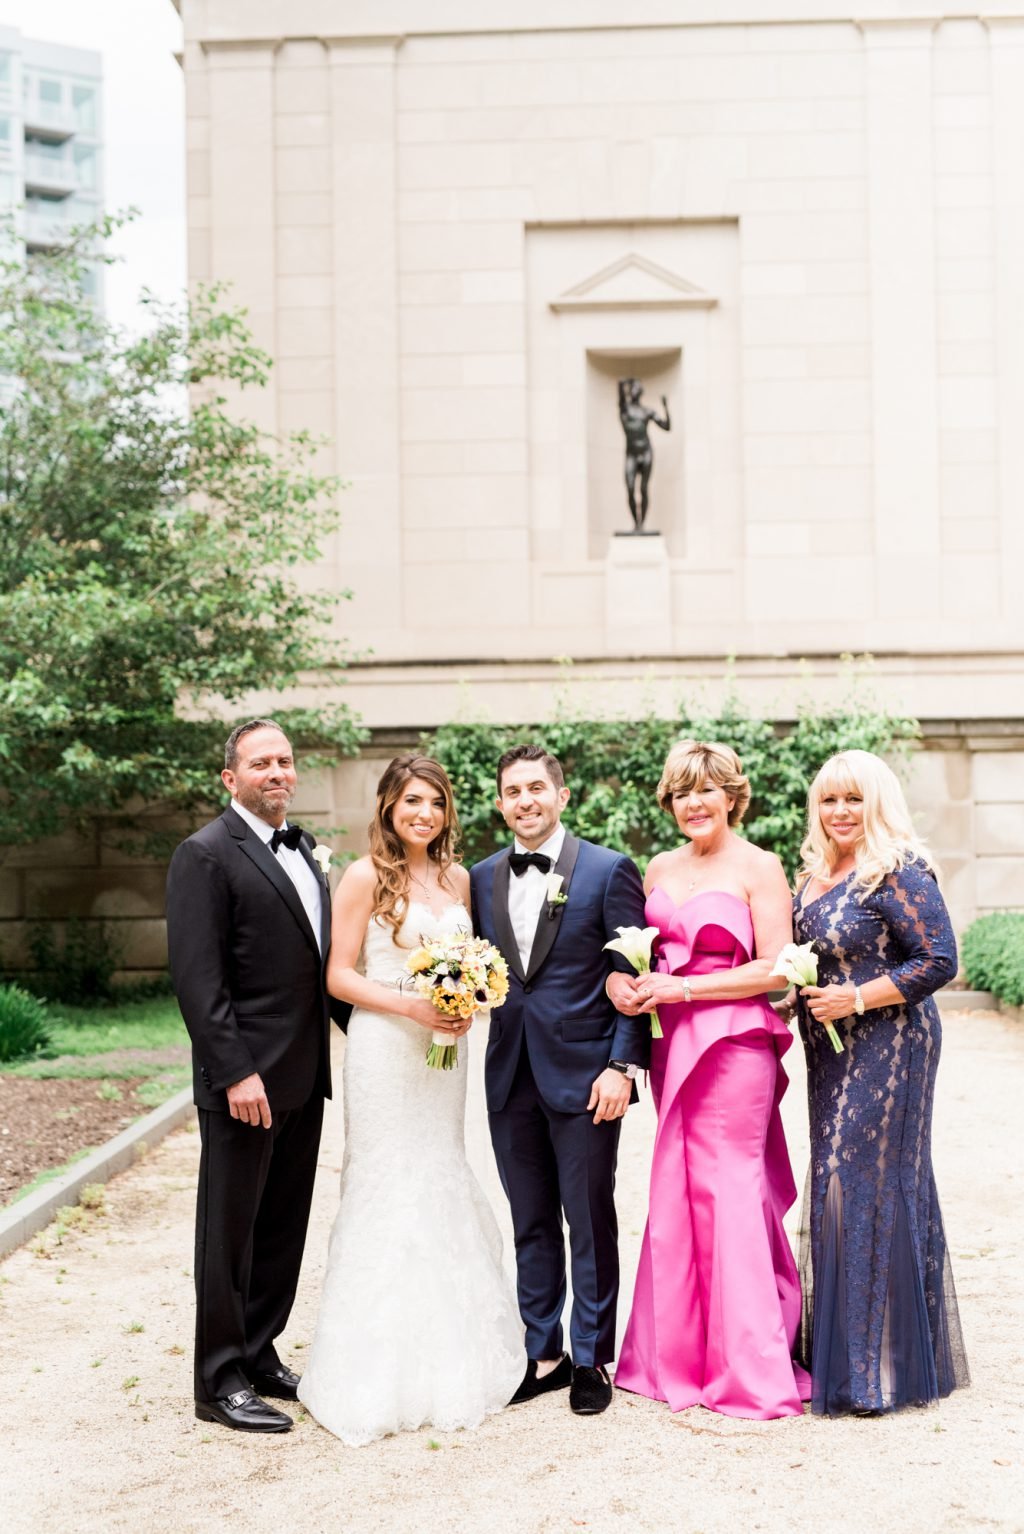 haleyrichterphoto-front-and-palmer-spring-wedding-rodin-museum-loews-hotel-philadelphia-053